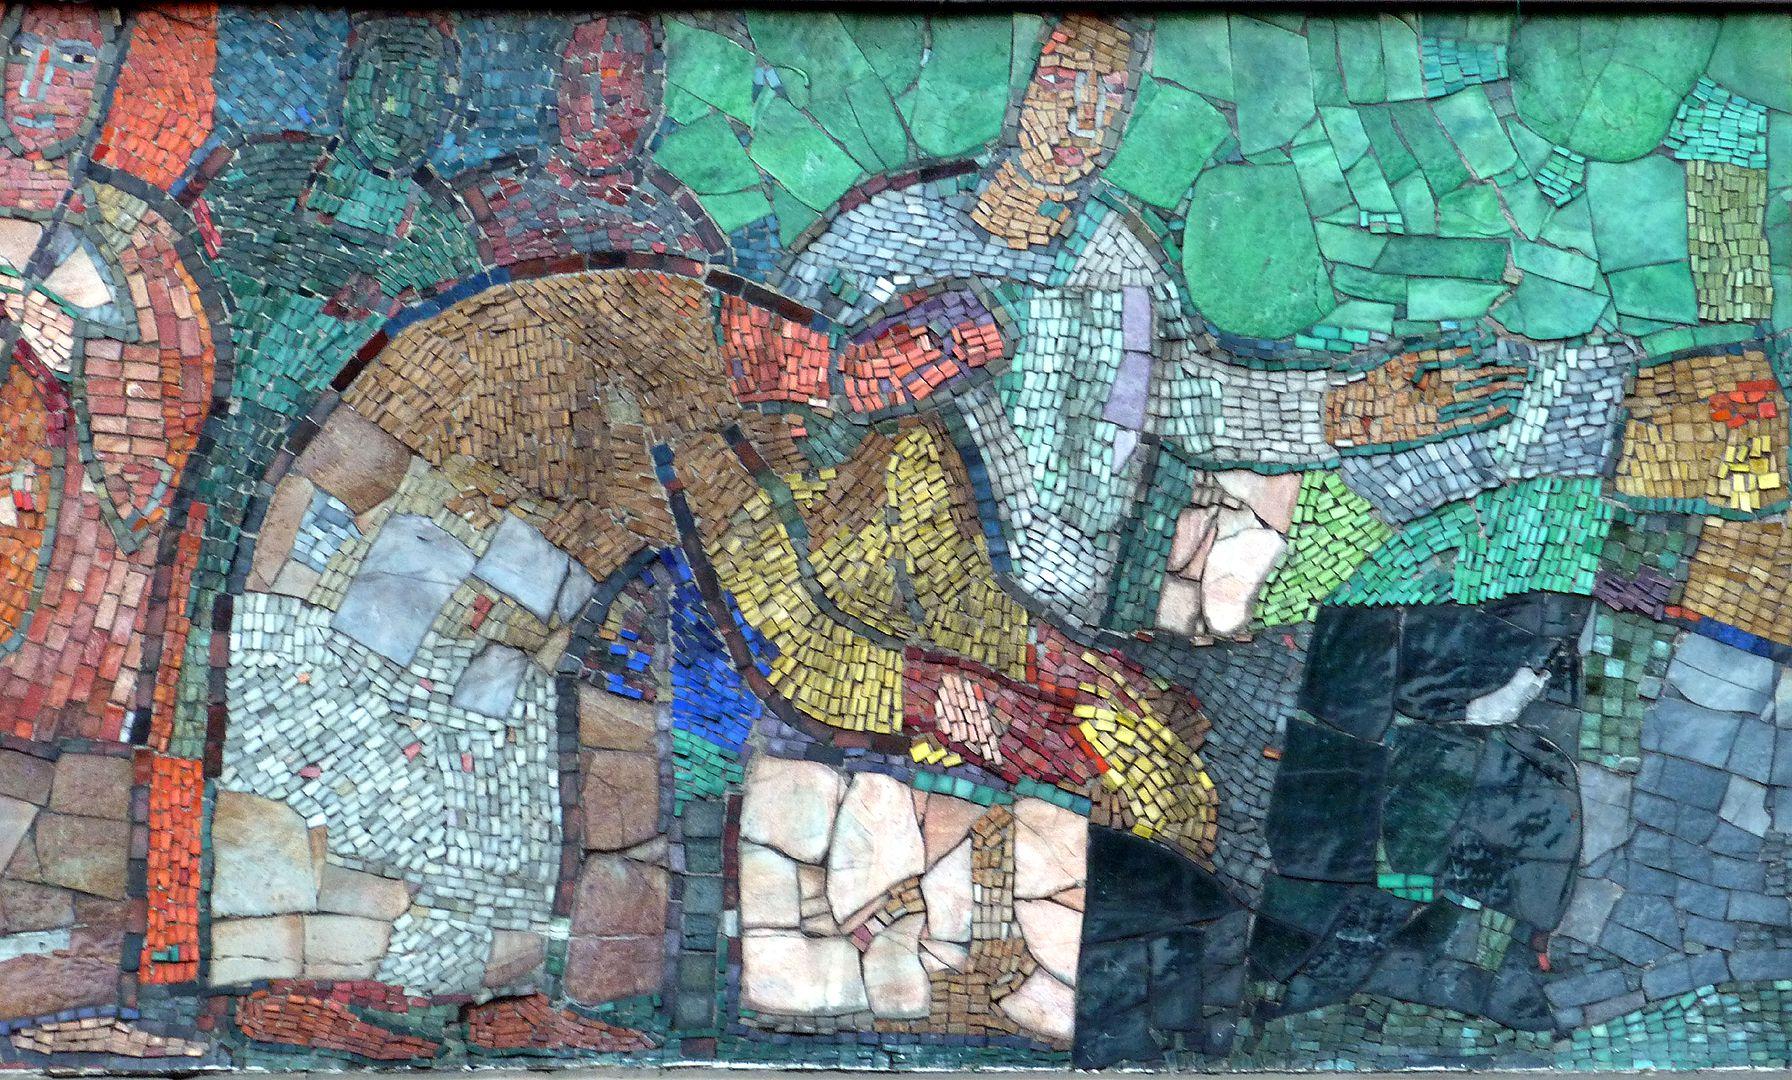 Mosaic on the Main Market (Hauptmarkt) in Nuremberg Traders